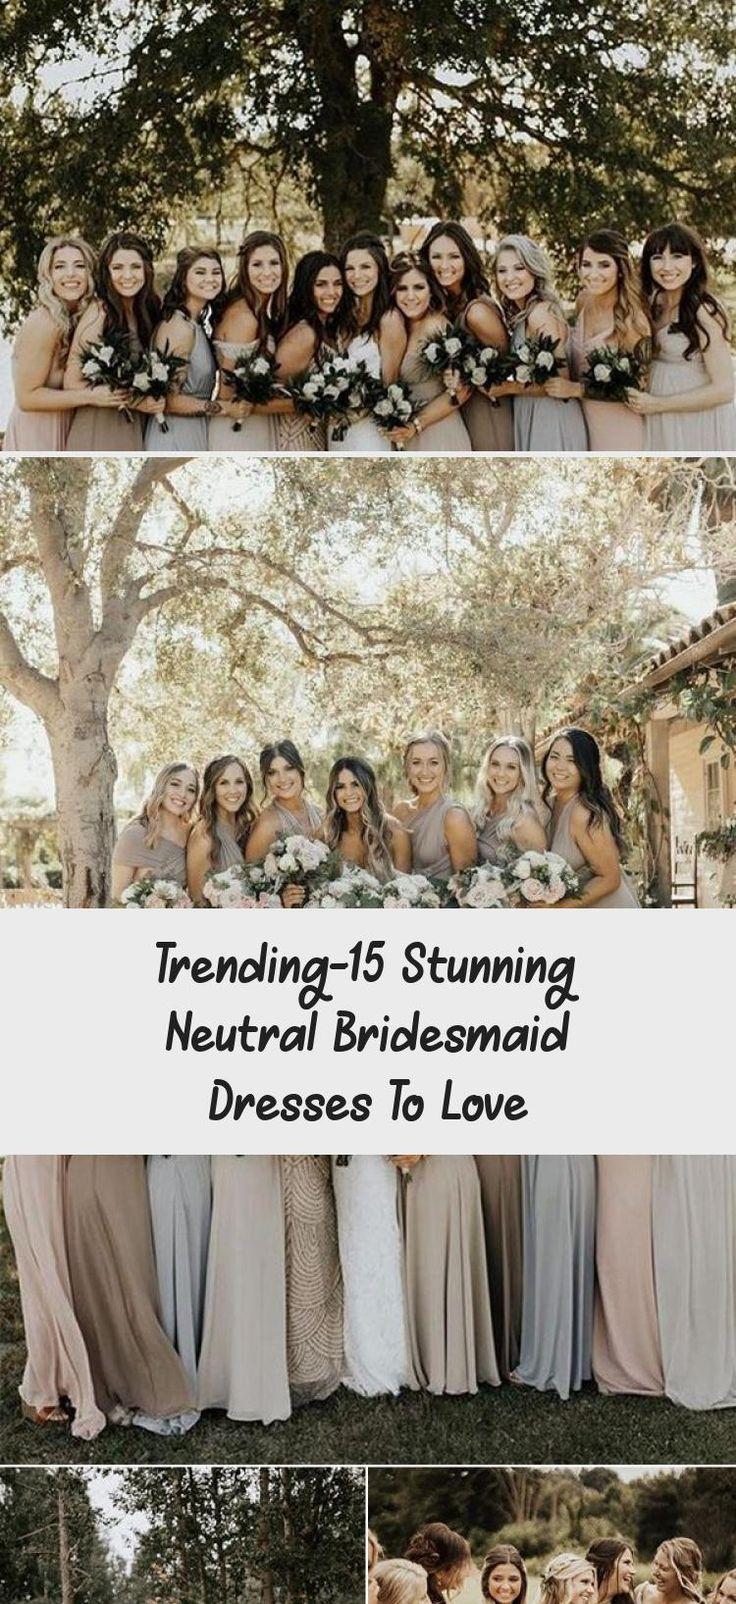 neutral champagne bridesmaid dresses #obde #weddingideas2019 #BridesmaidDresses2018 #BridesmaidDressesTeaLength #UniqueBridesmaidDresses #BridesmaidDressesSpring #NeutralBridesmaidDresses